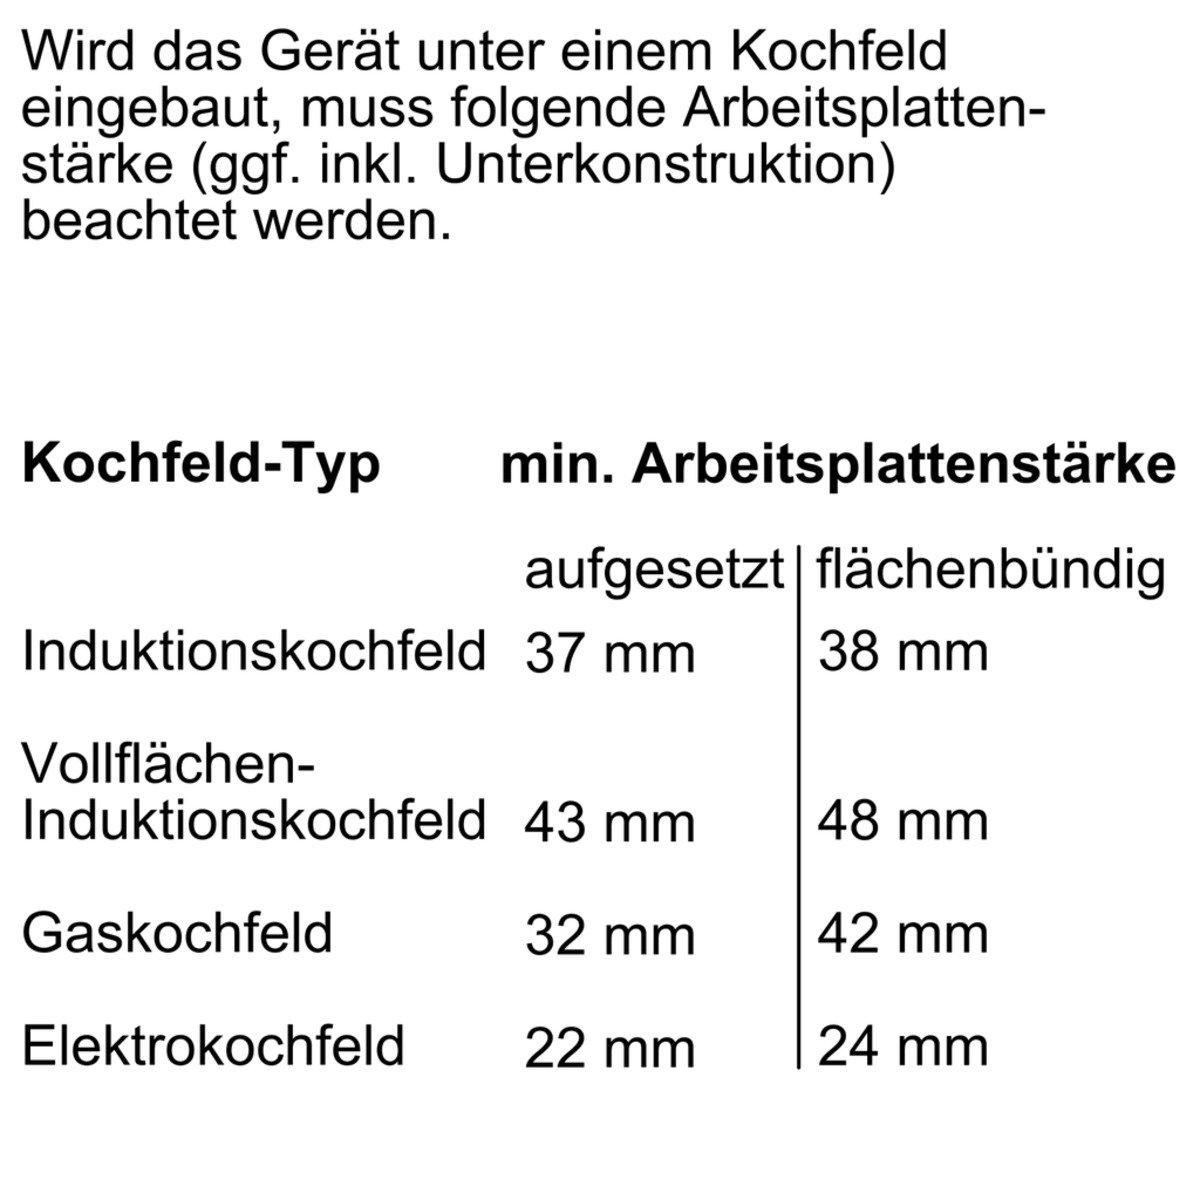 Induktionskochfeld arbeitsplattendicke